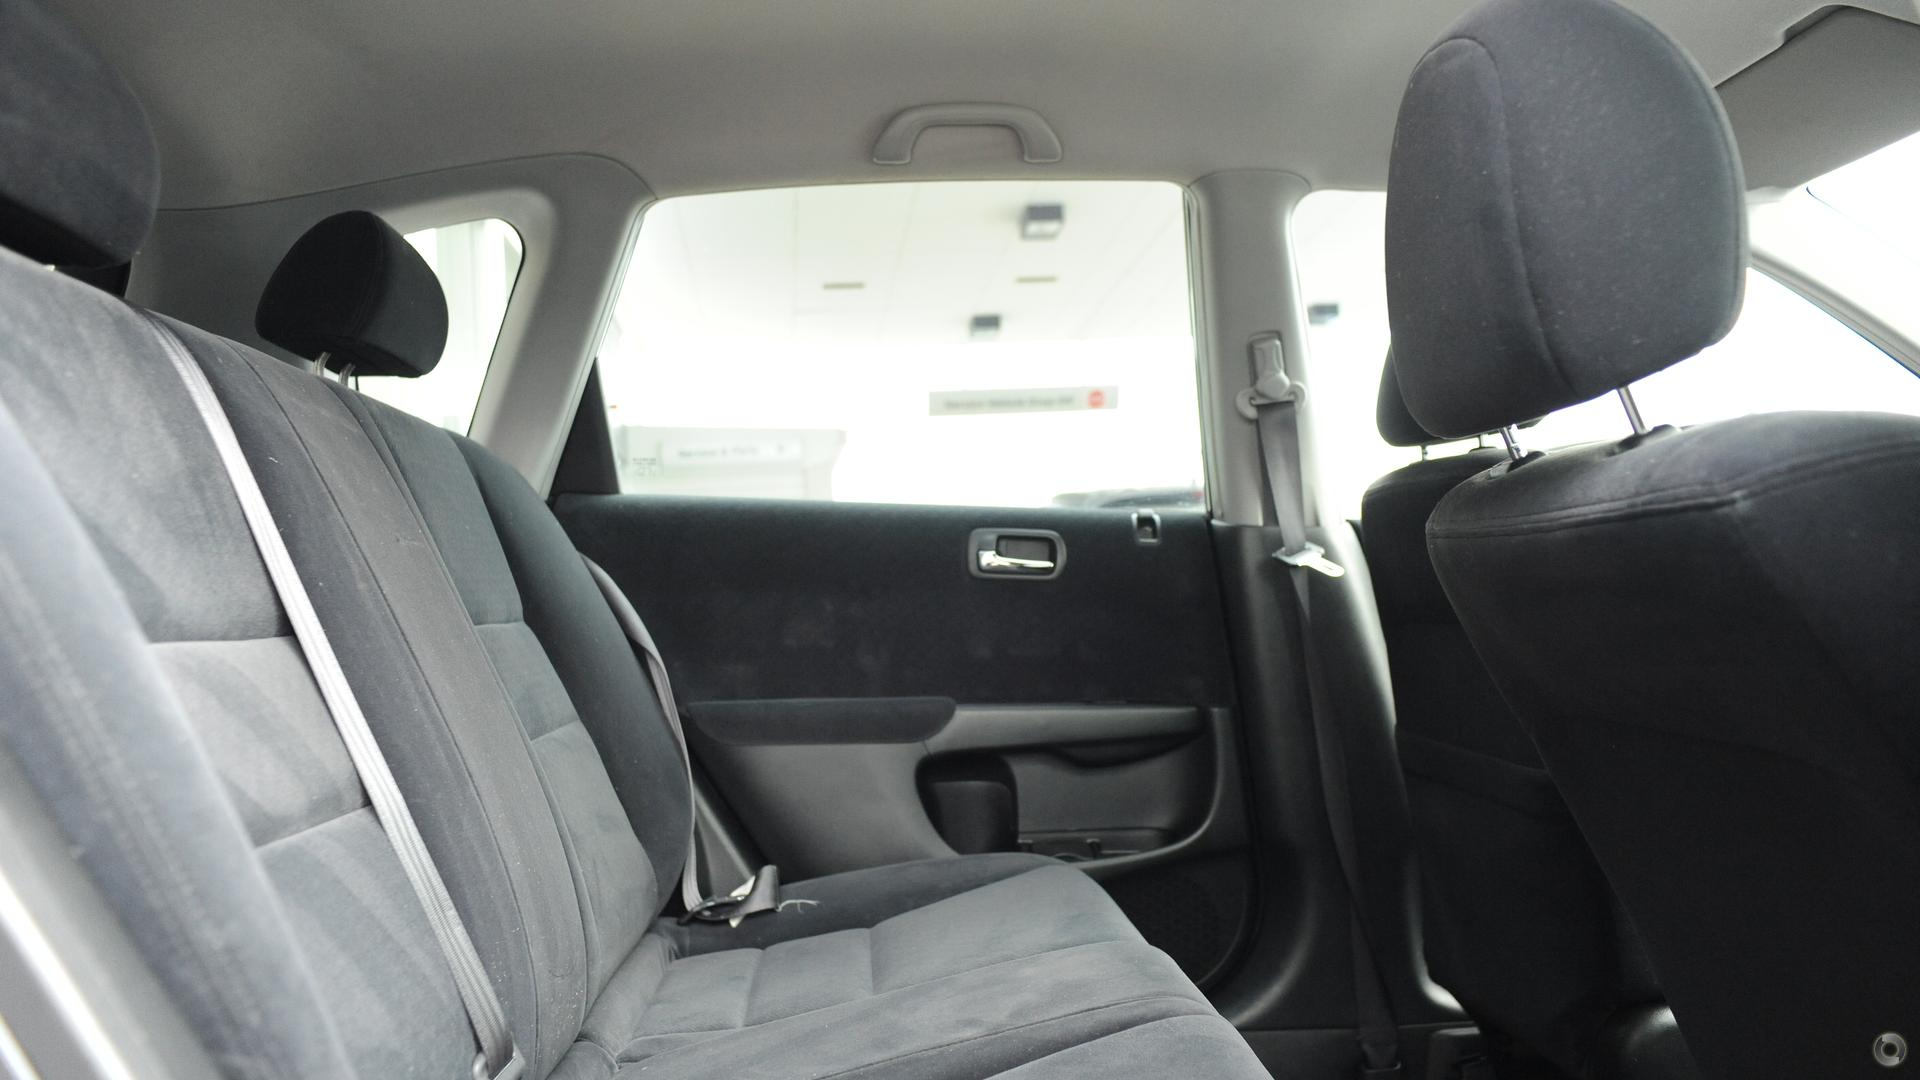 2004 Honda Civic Vi 7th Gen